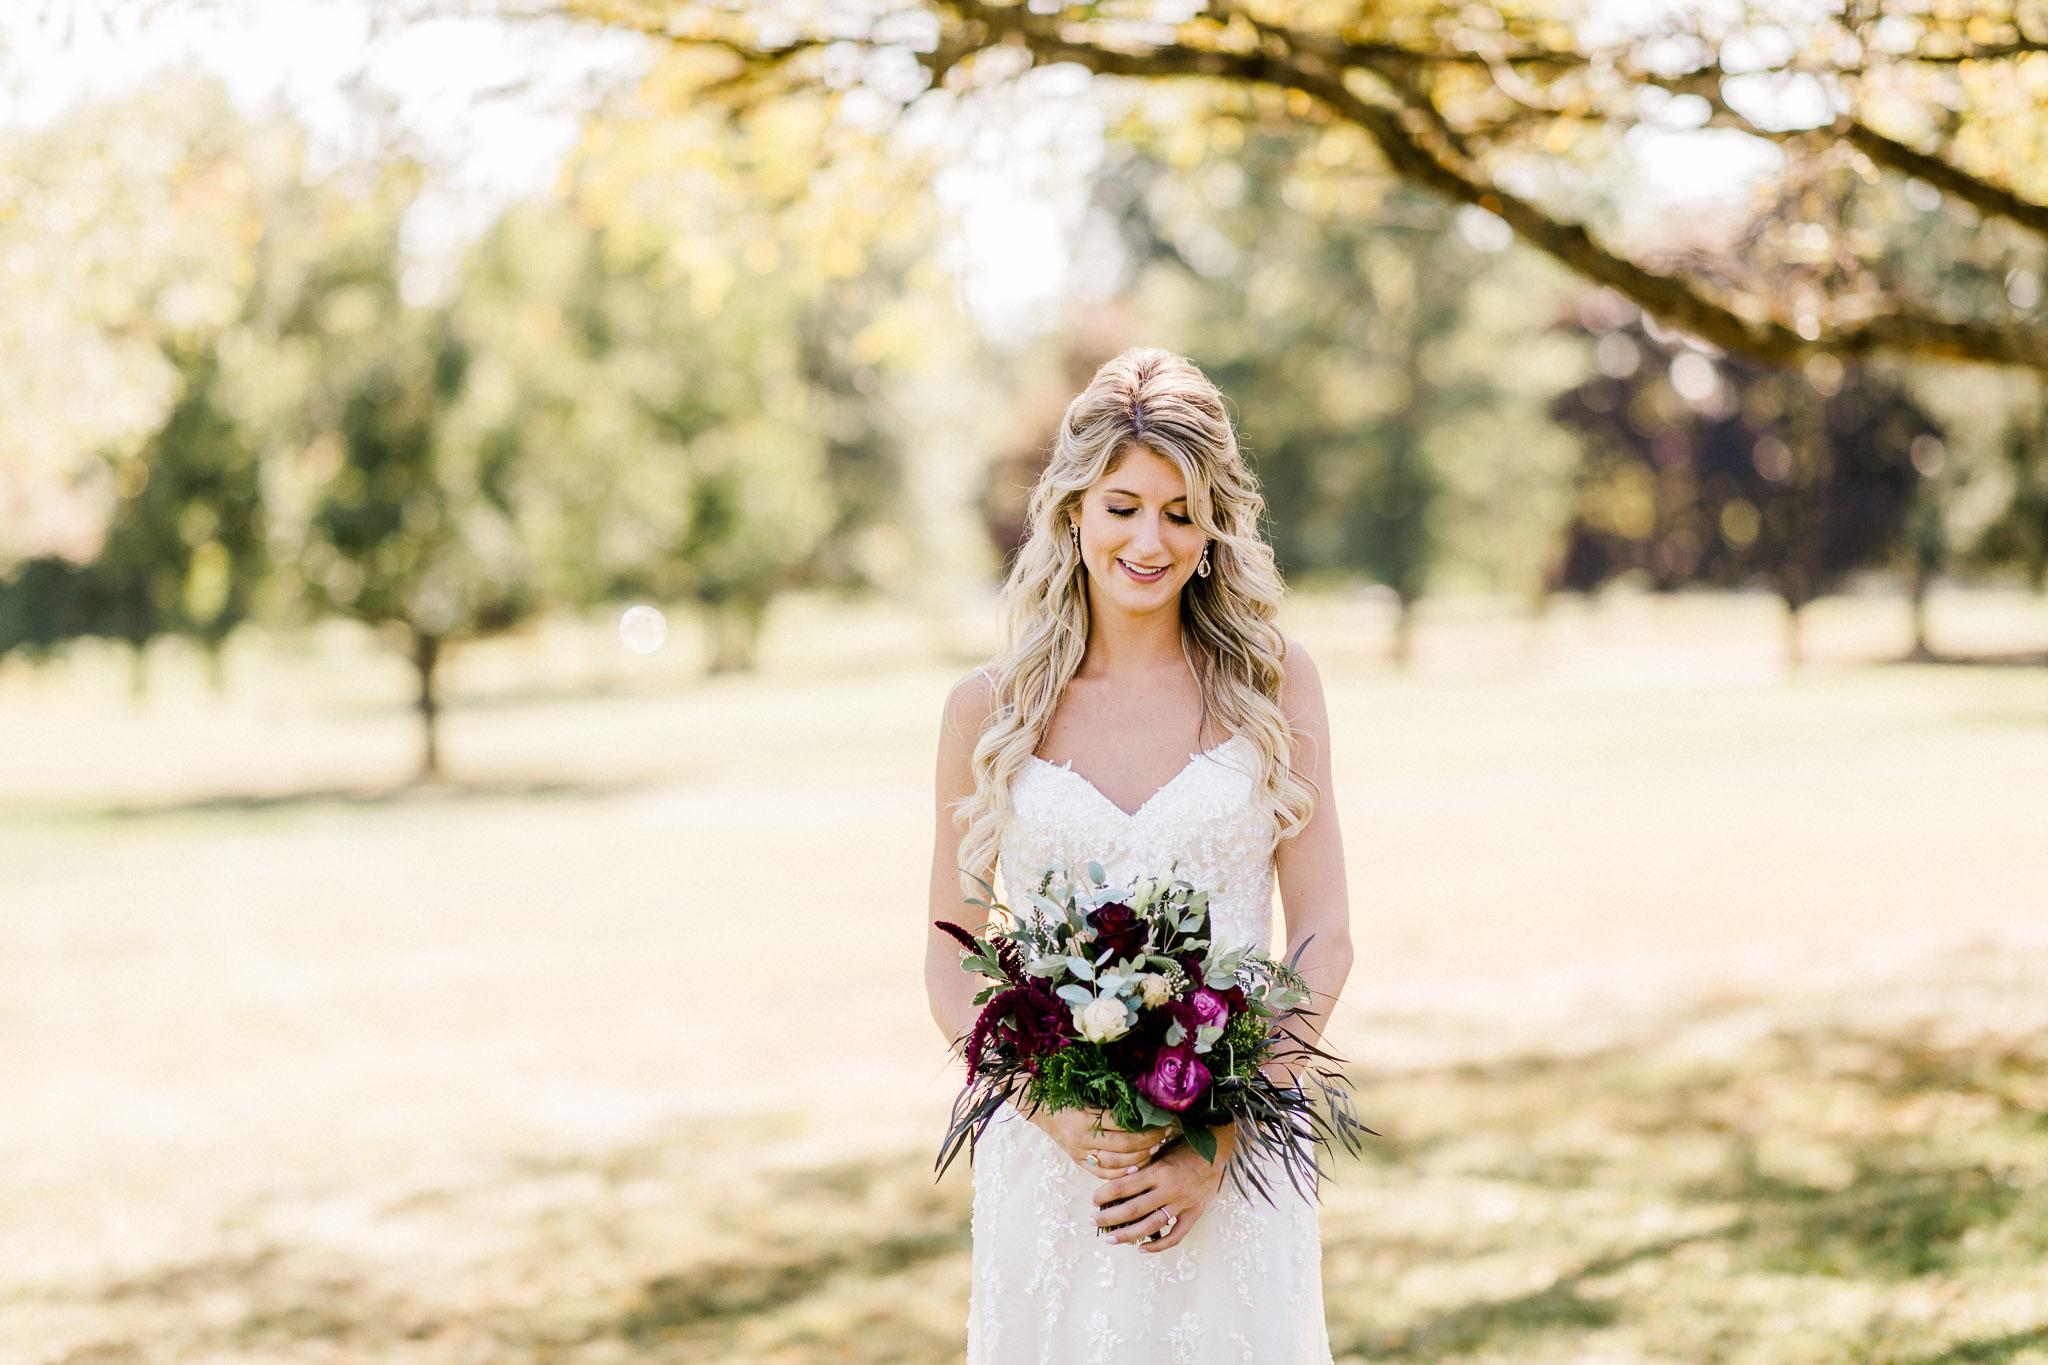 Frosty-Valley-September-Wedding-7550.jpg